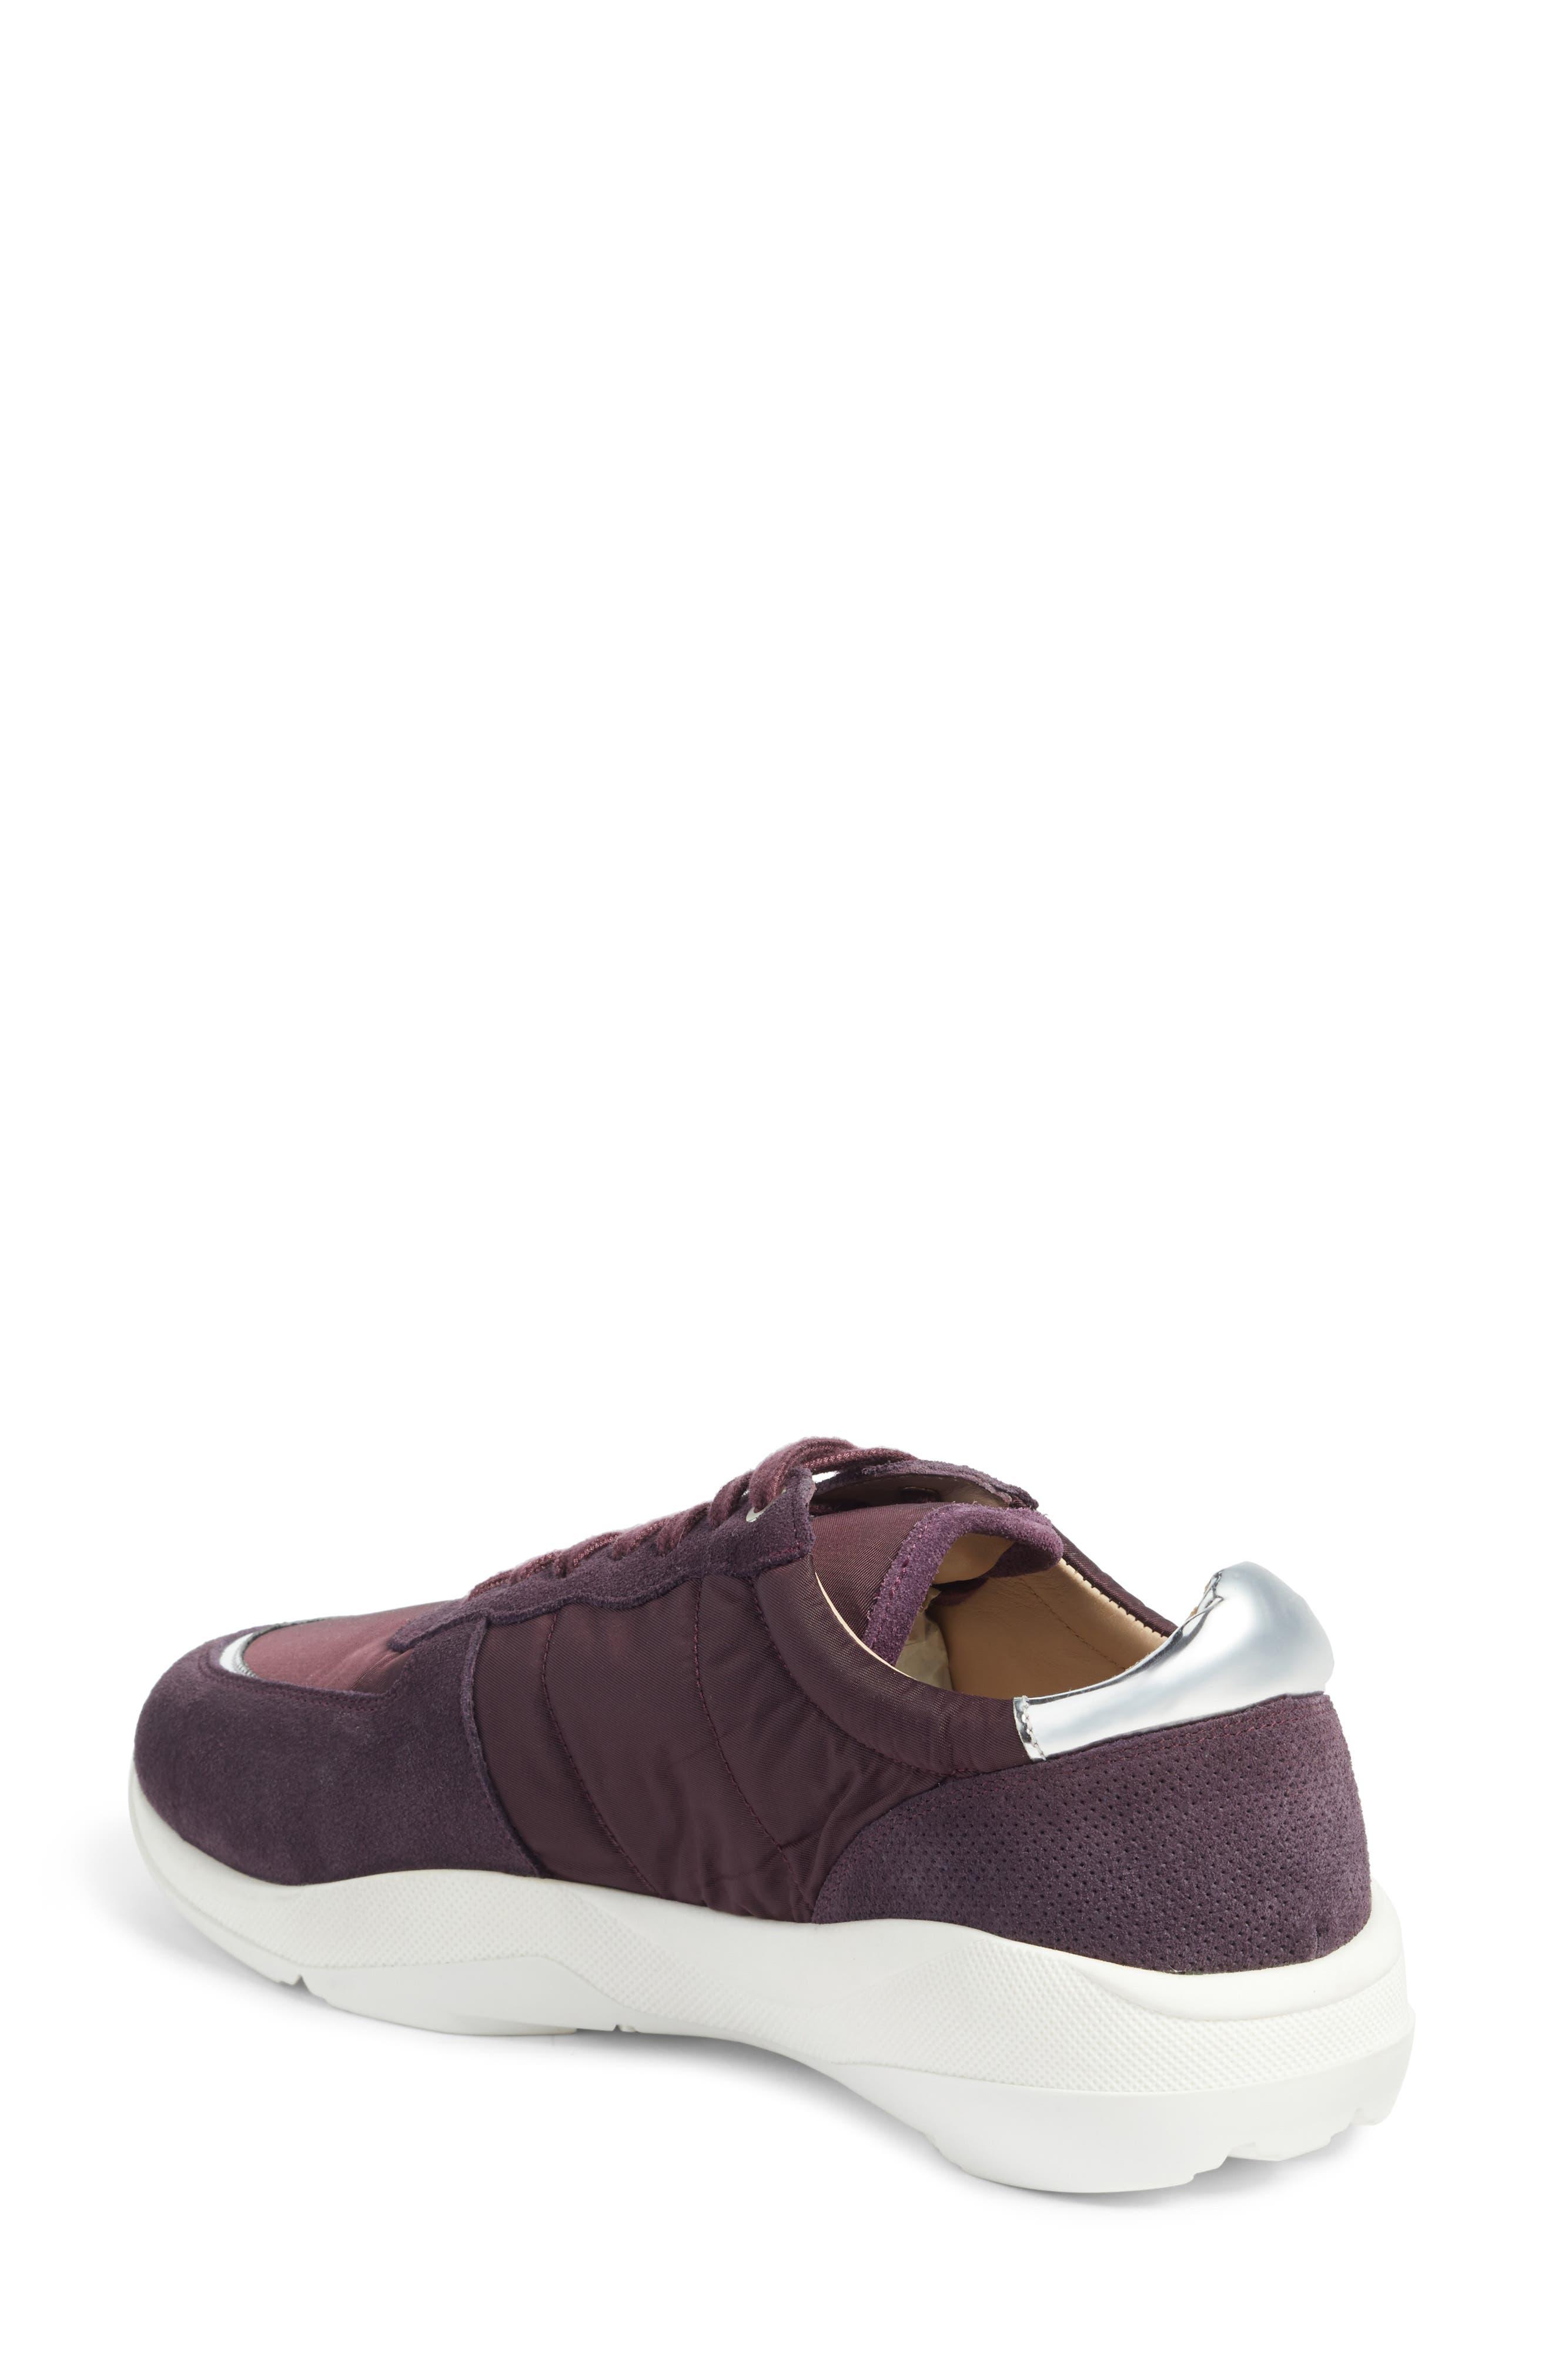 Geo Sneaker,                             Alternate thumbnail 2, color,                             500